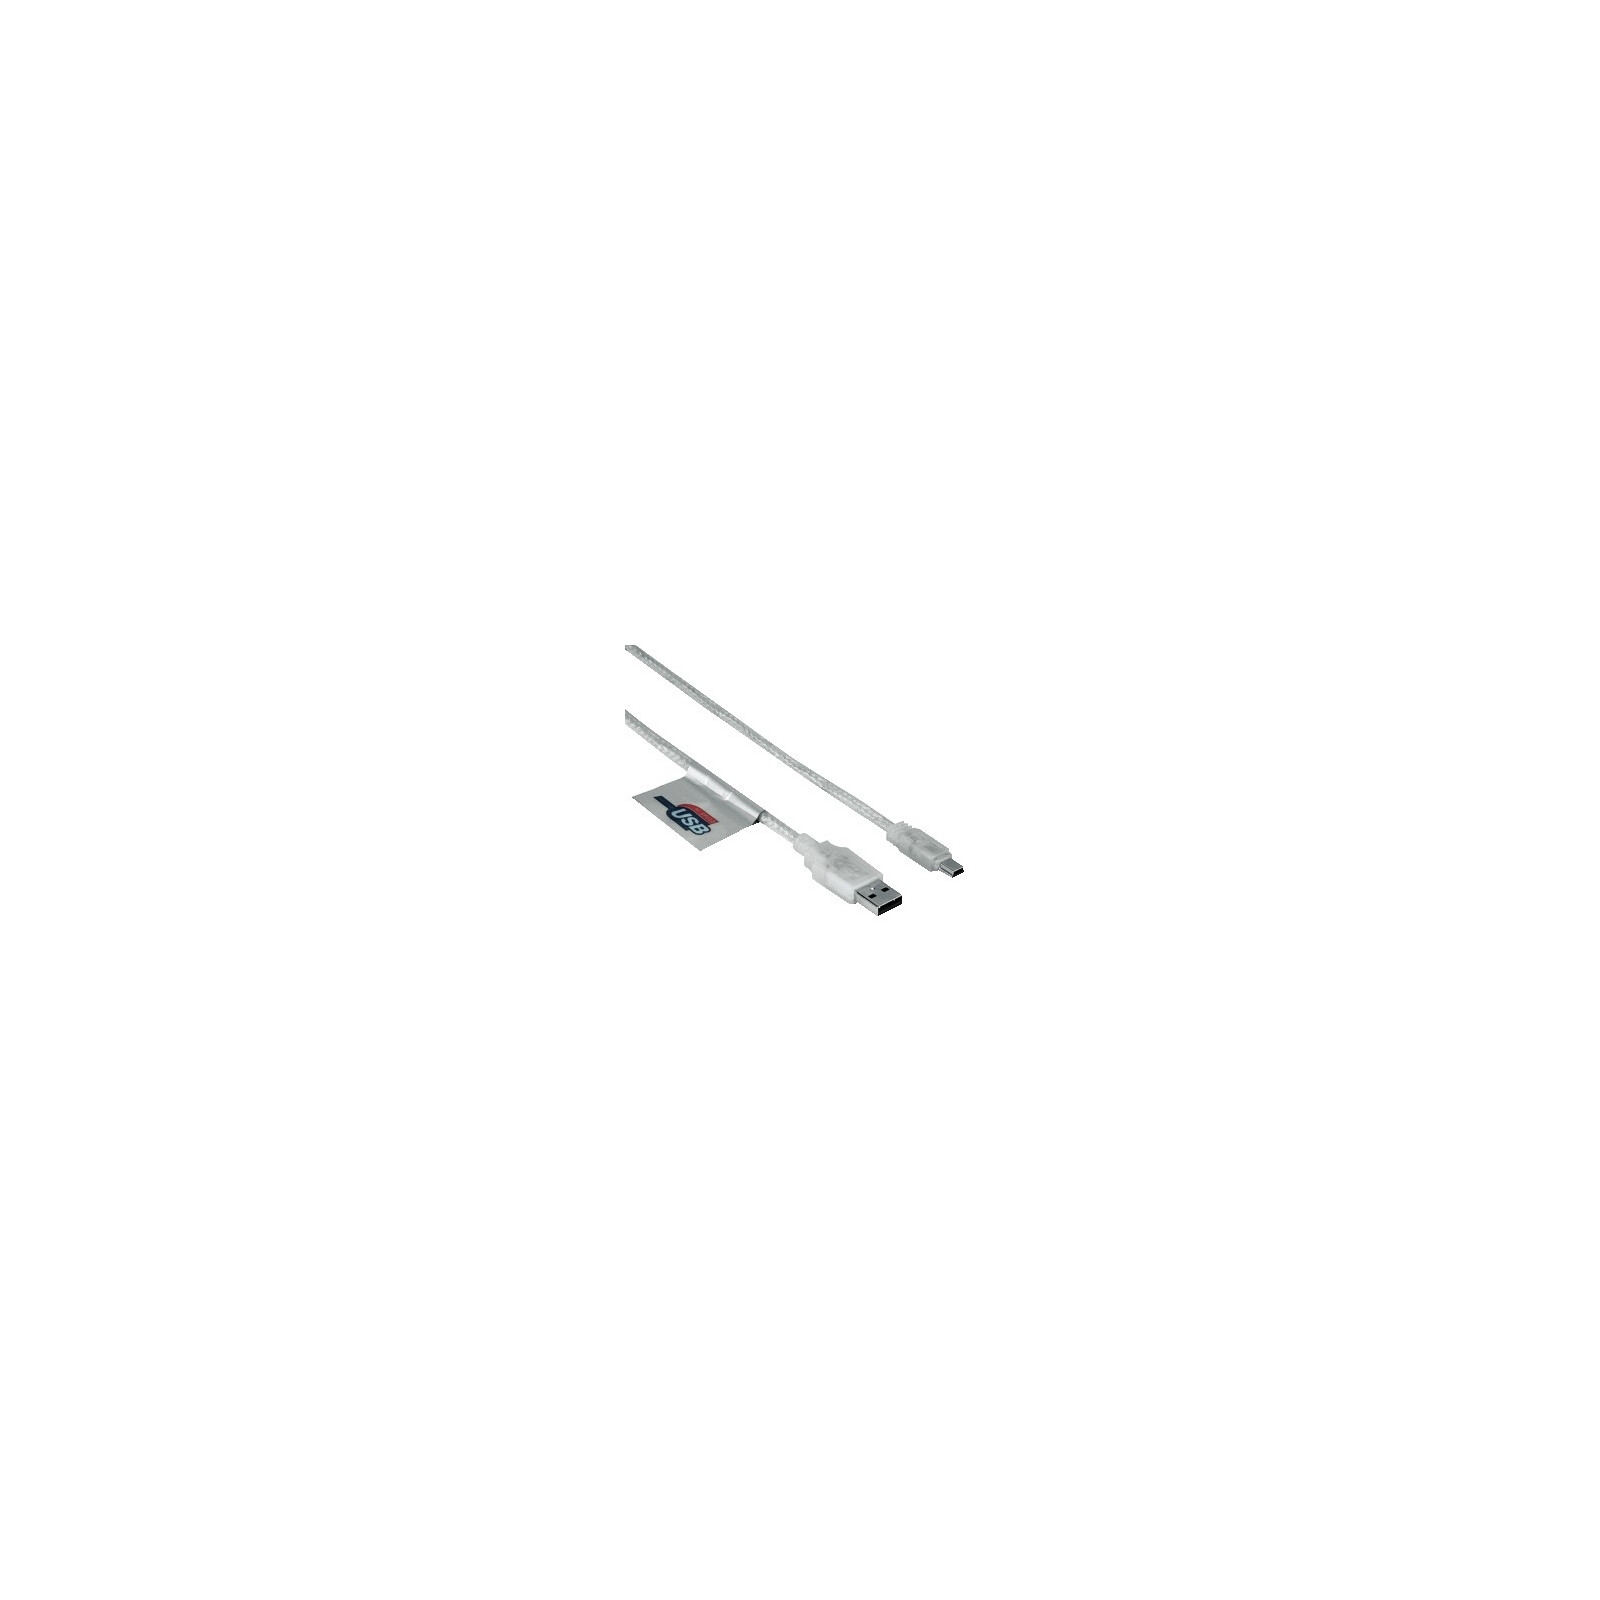 Hama 39744 Mini-USB-2.0-Kabel, vergoldet, doppelt geschirmt,